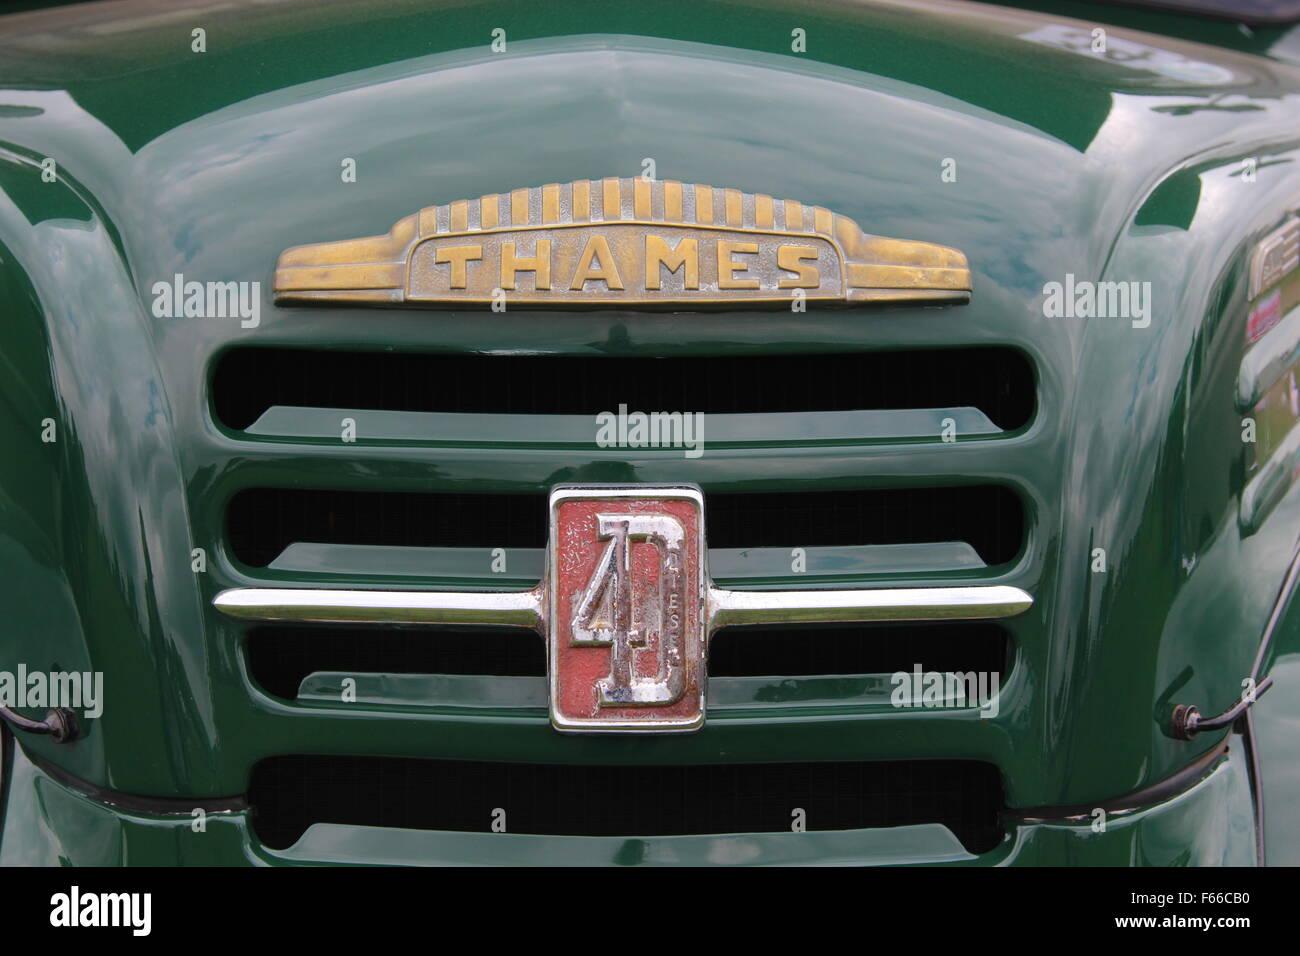 Radiator on a Ford Thames Trader  4D  MK2 diesel truck - Stock Image